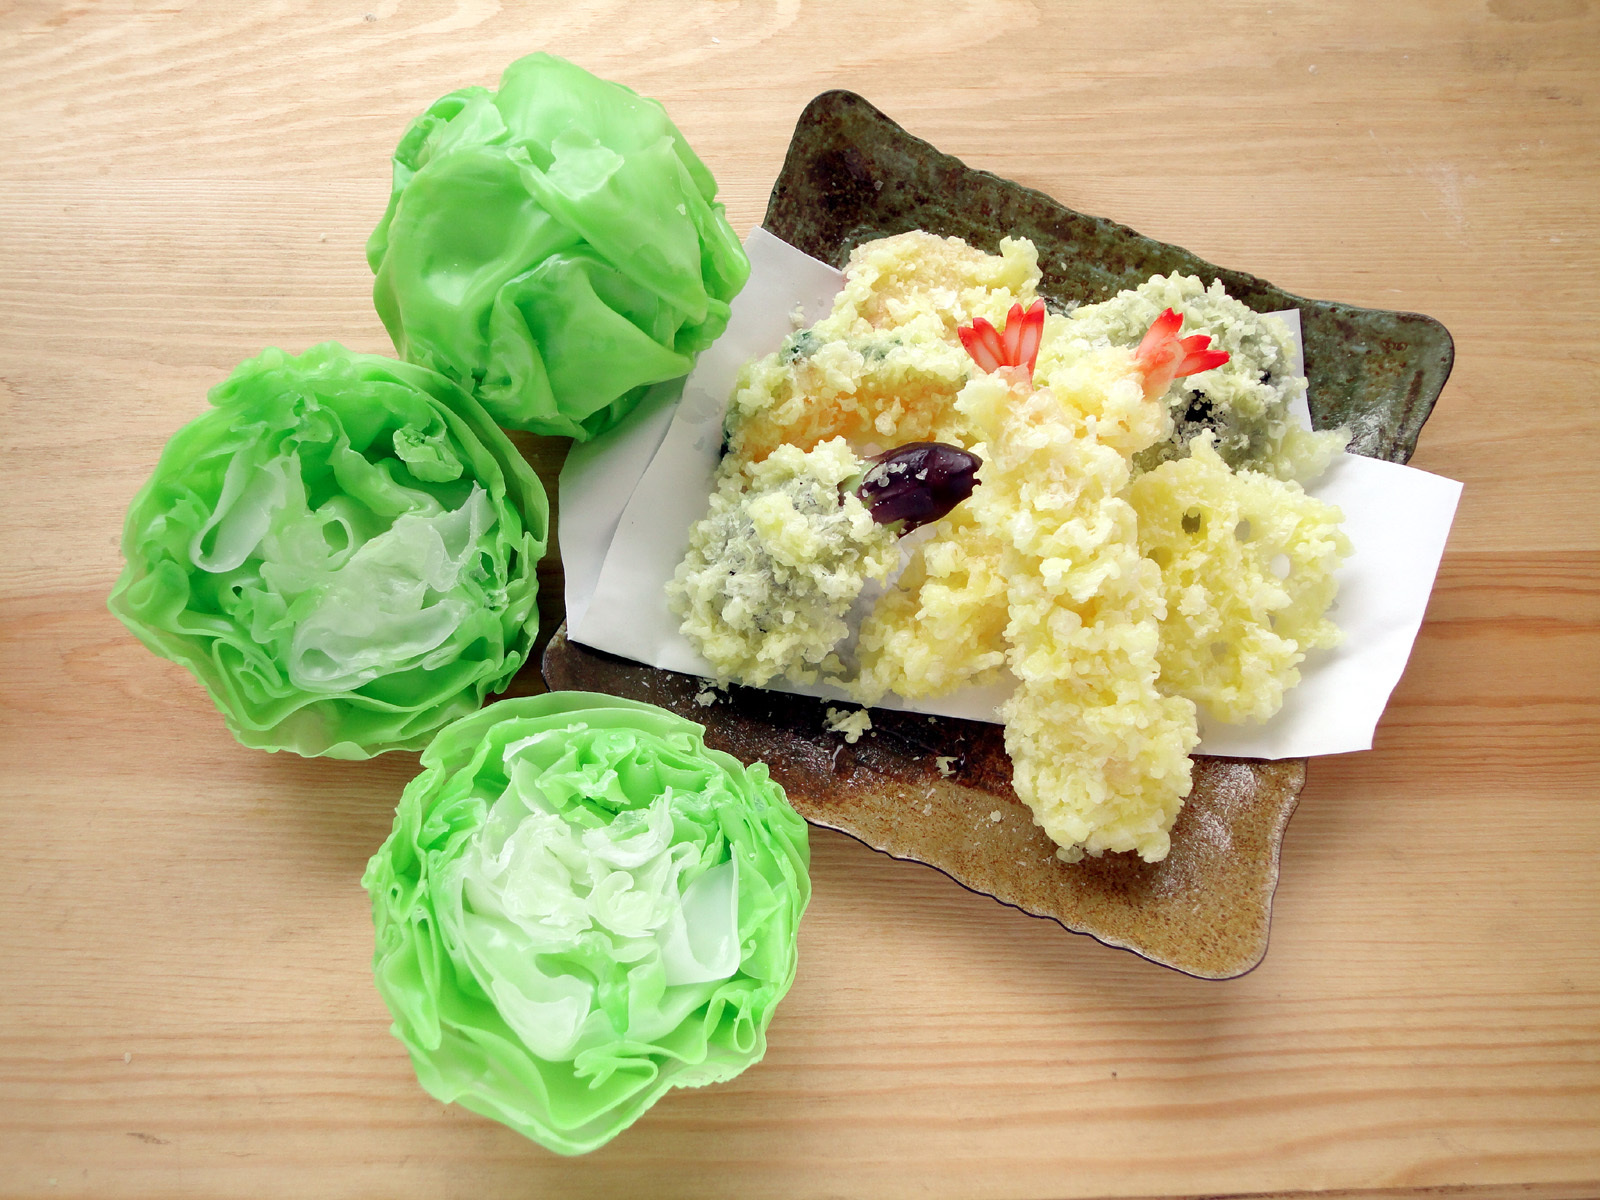 Ganso Shokuhin Sample-ya fake food